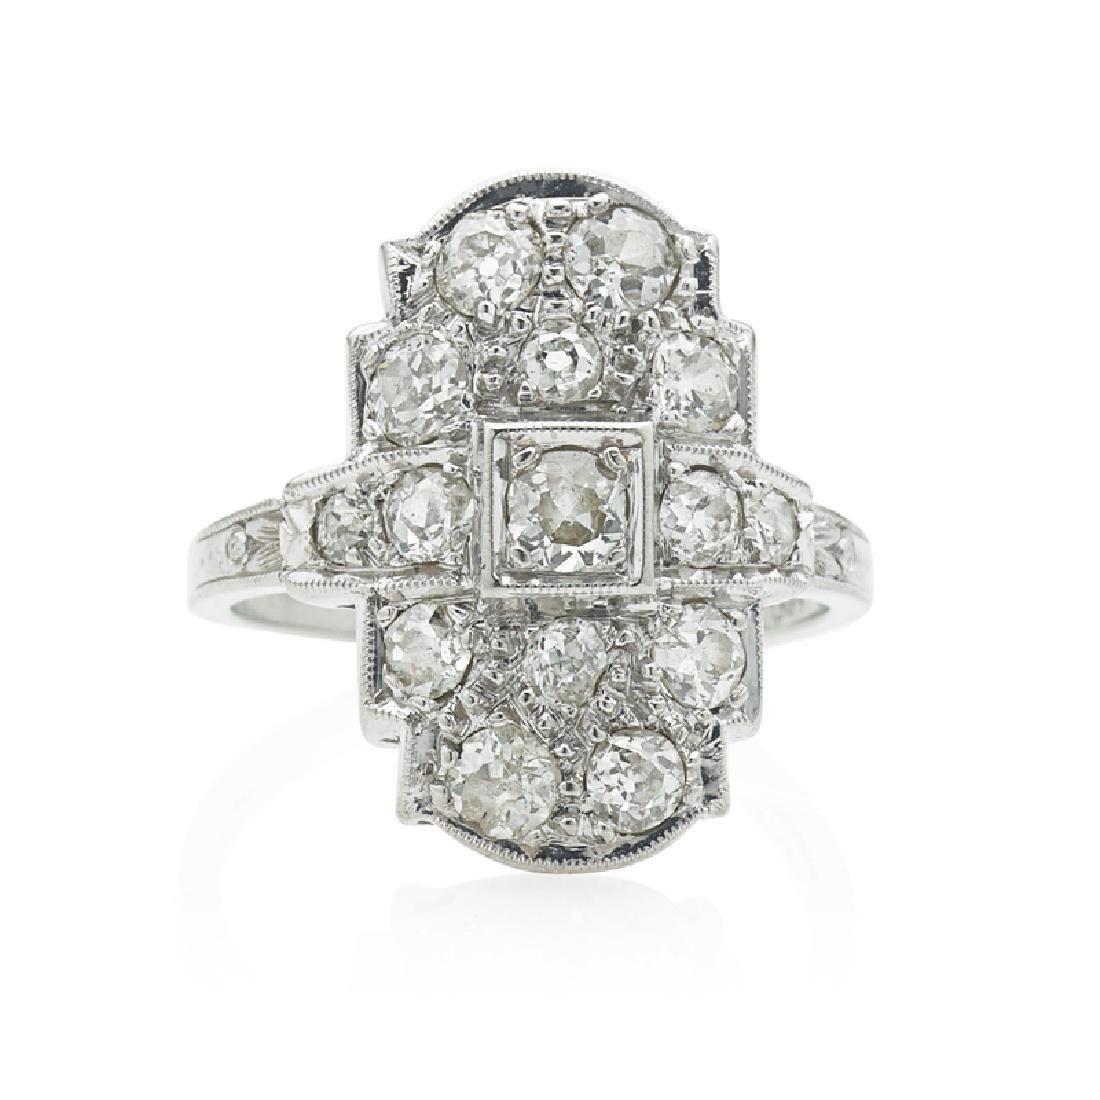 EDWARDIAN DIAMOND & PLATINUM RING